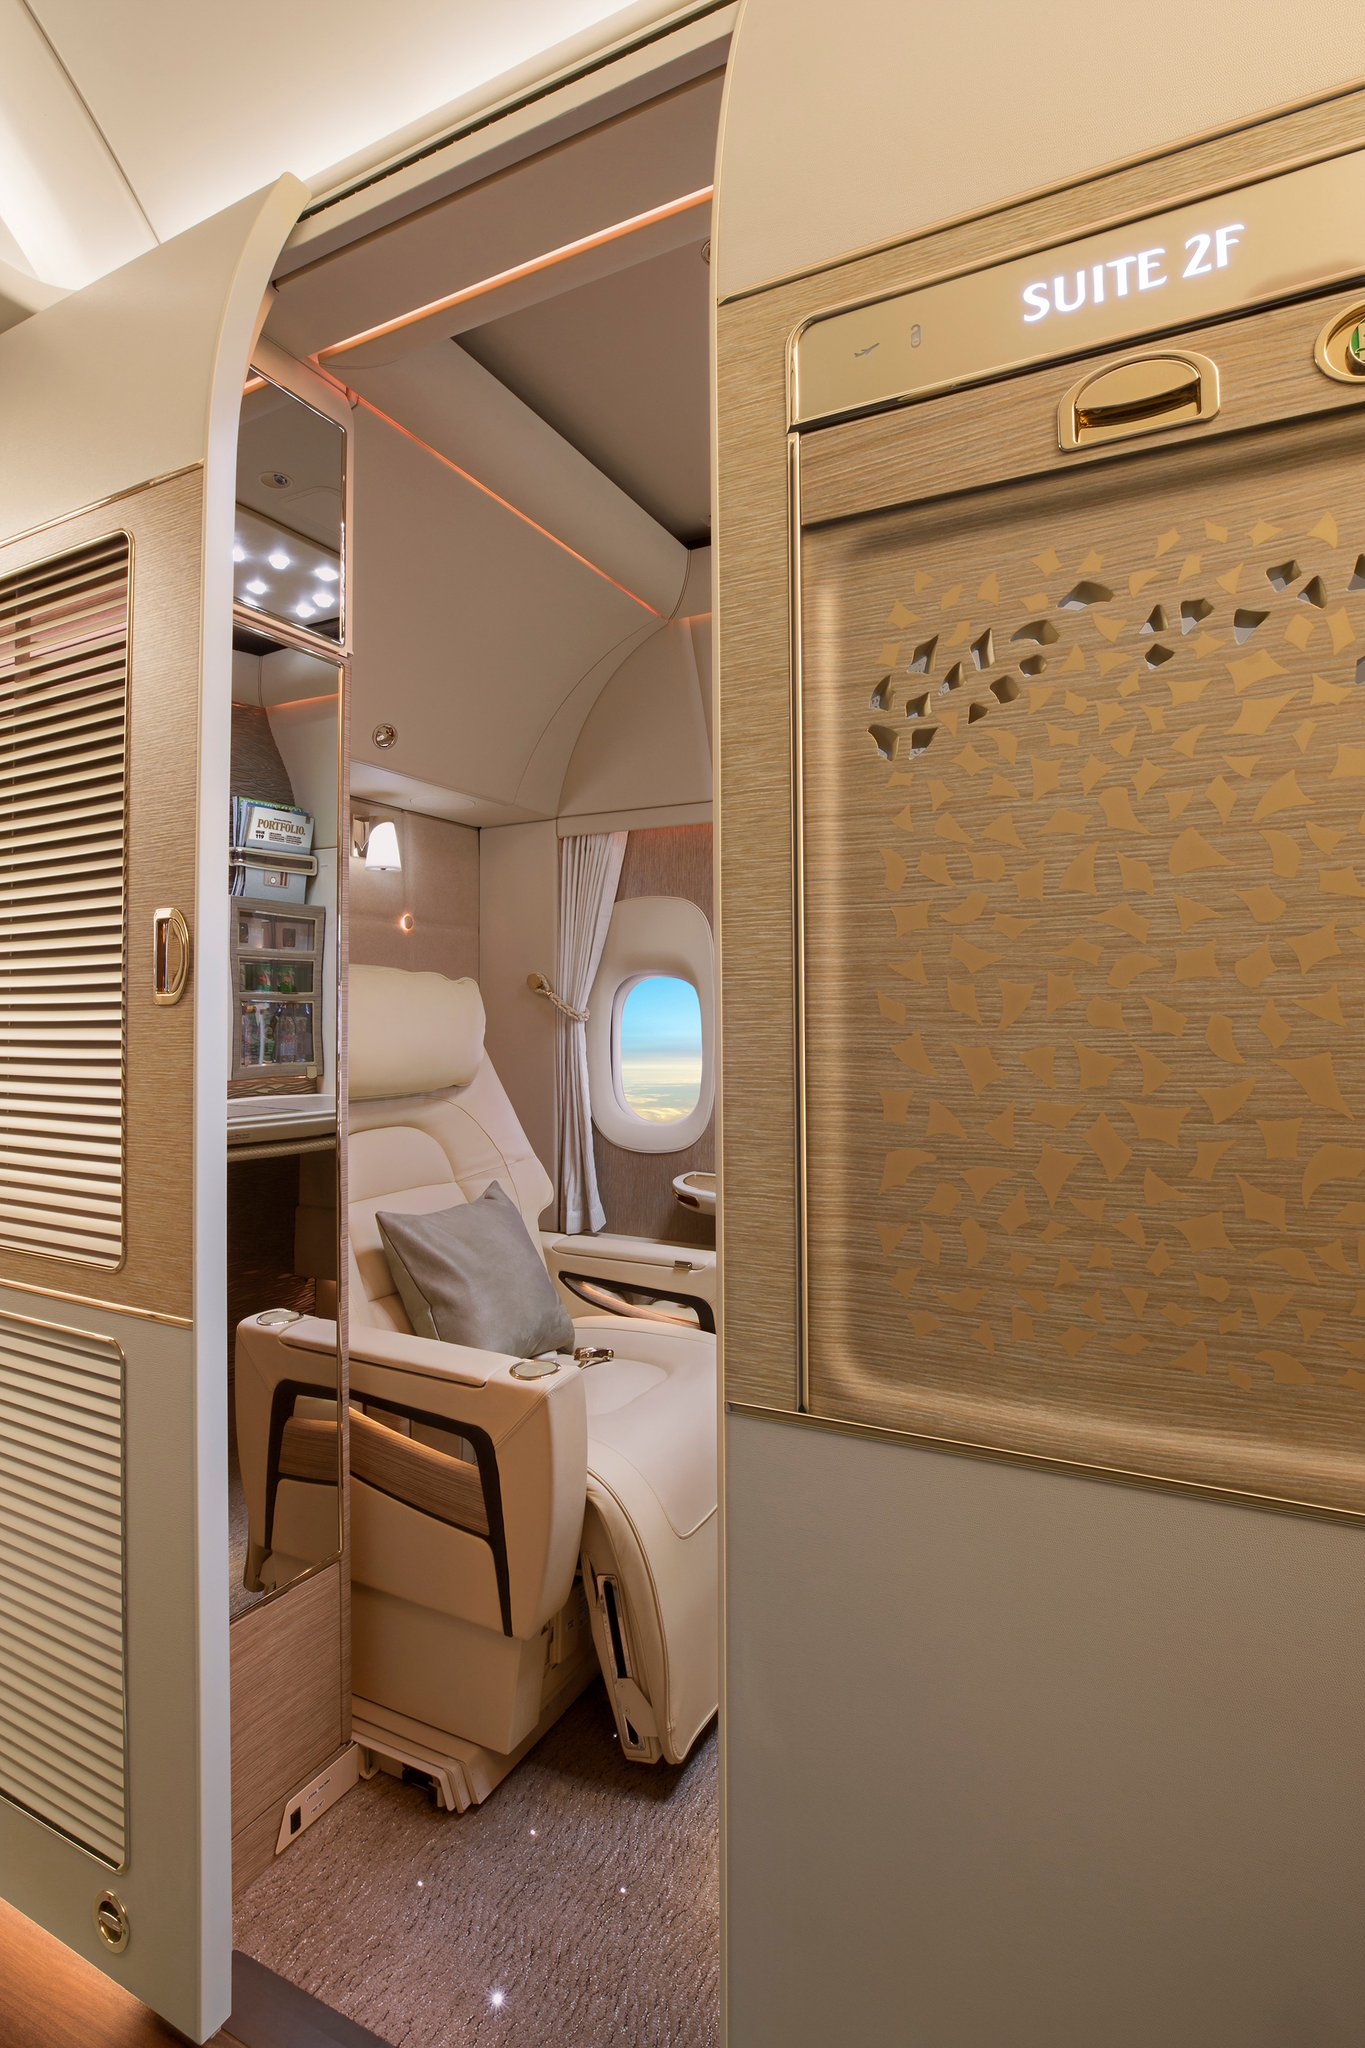 DOrNlctXUAA9zCK - Emirates inaugura cabina de Primera en sus nuevos Boeing 777 #GameChanger